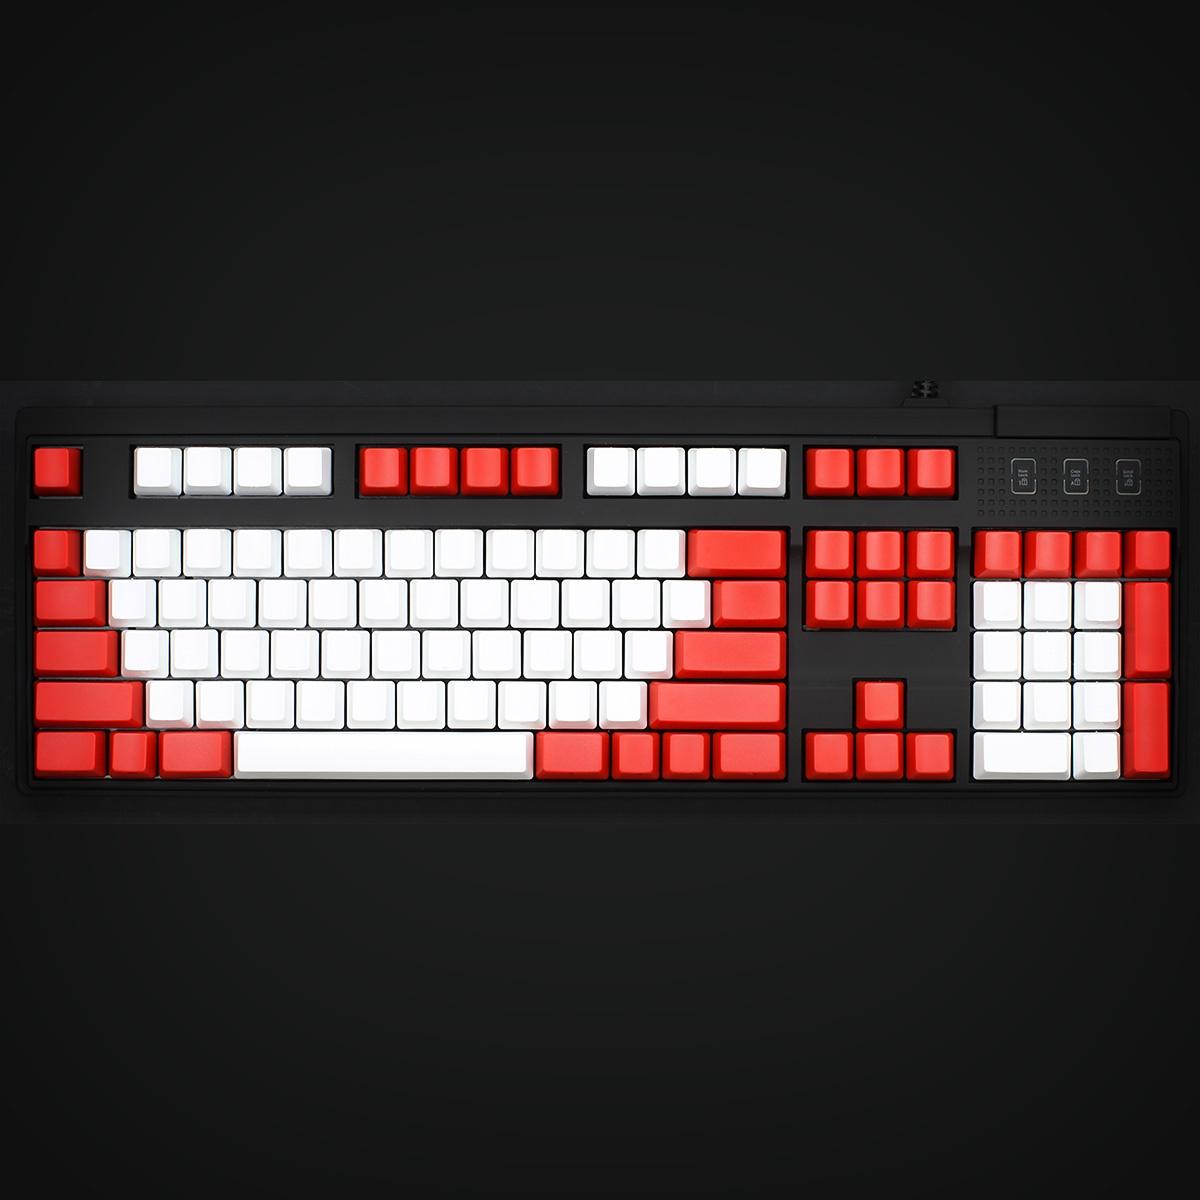 Max Keyboard Custom Mechanical Keyboards Image Gallery